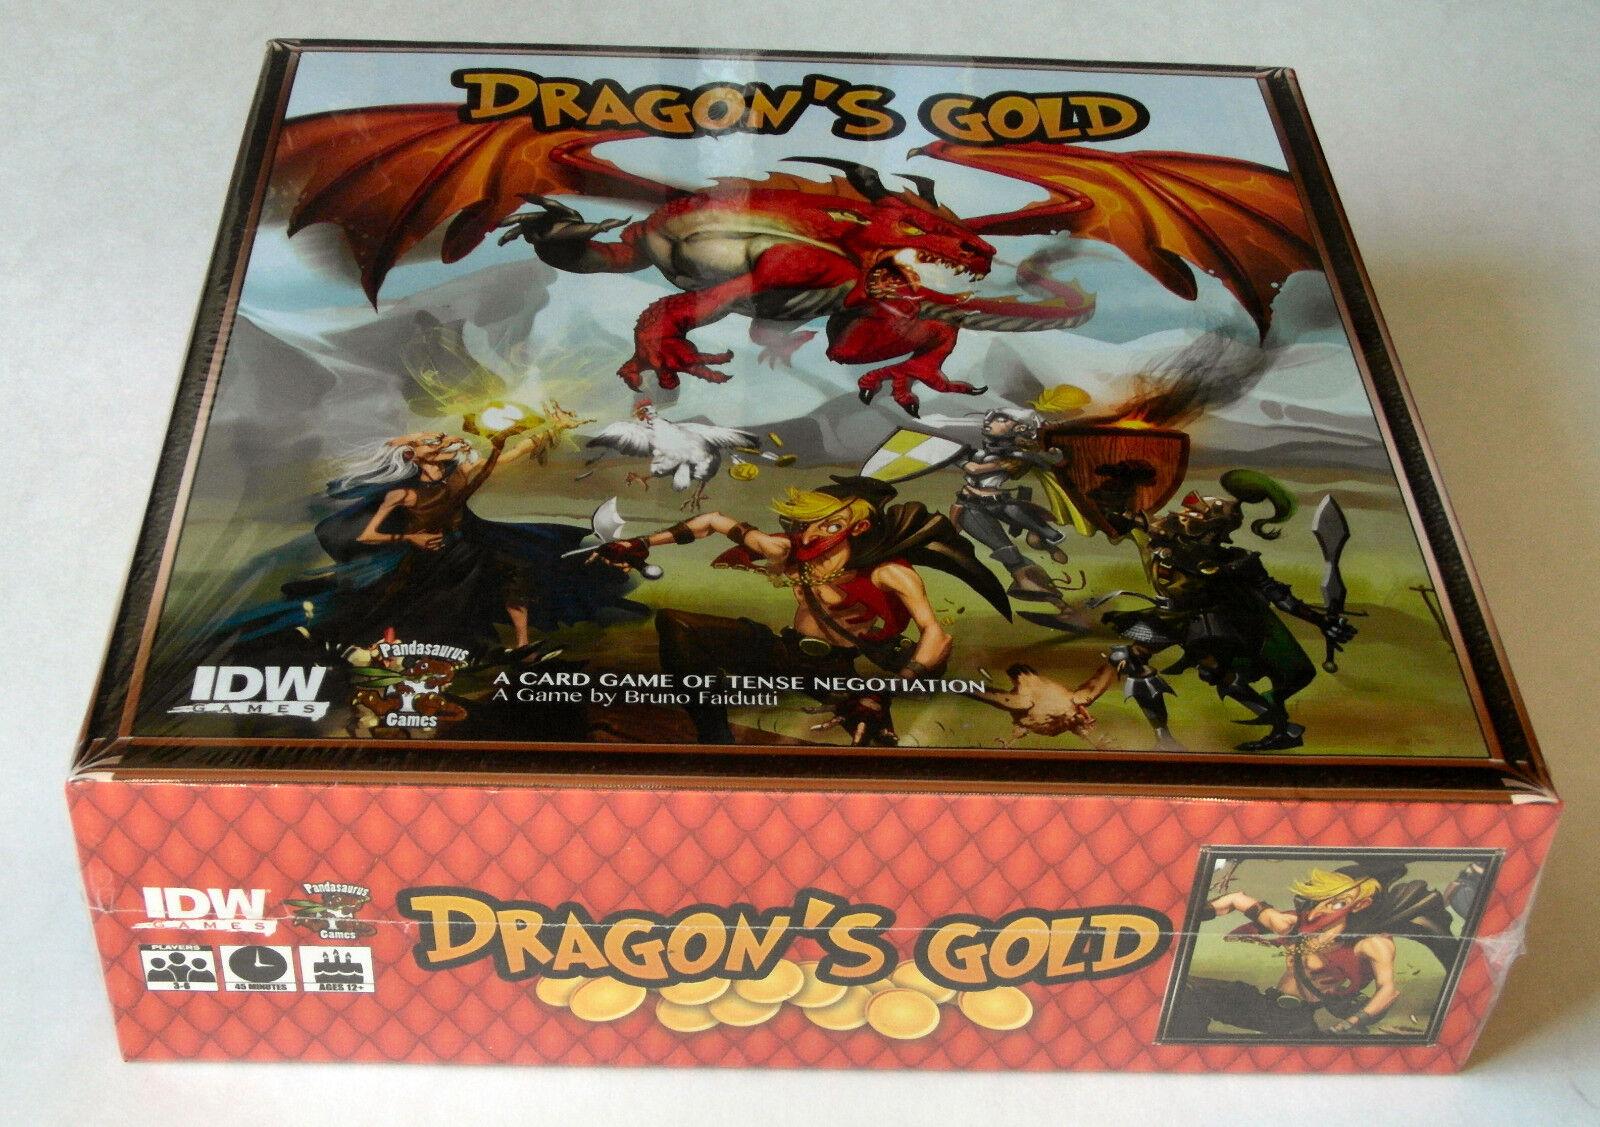 Dragon's gold - IDW Games - 2001